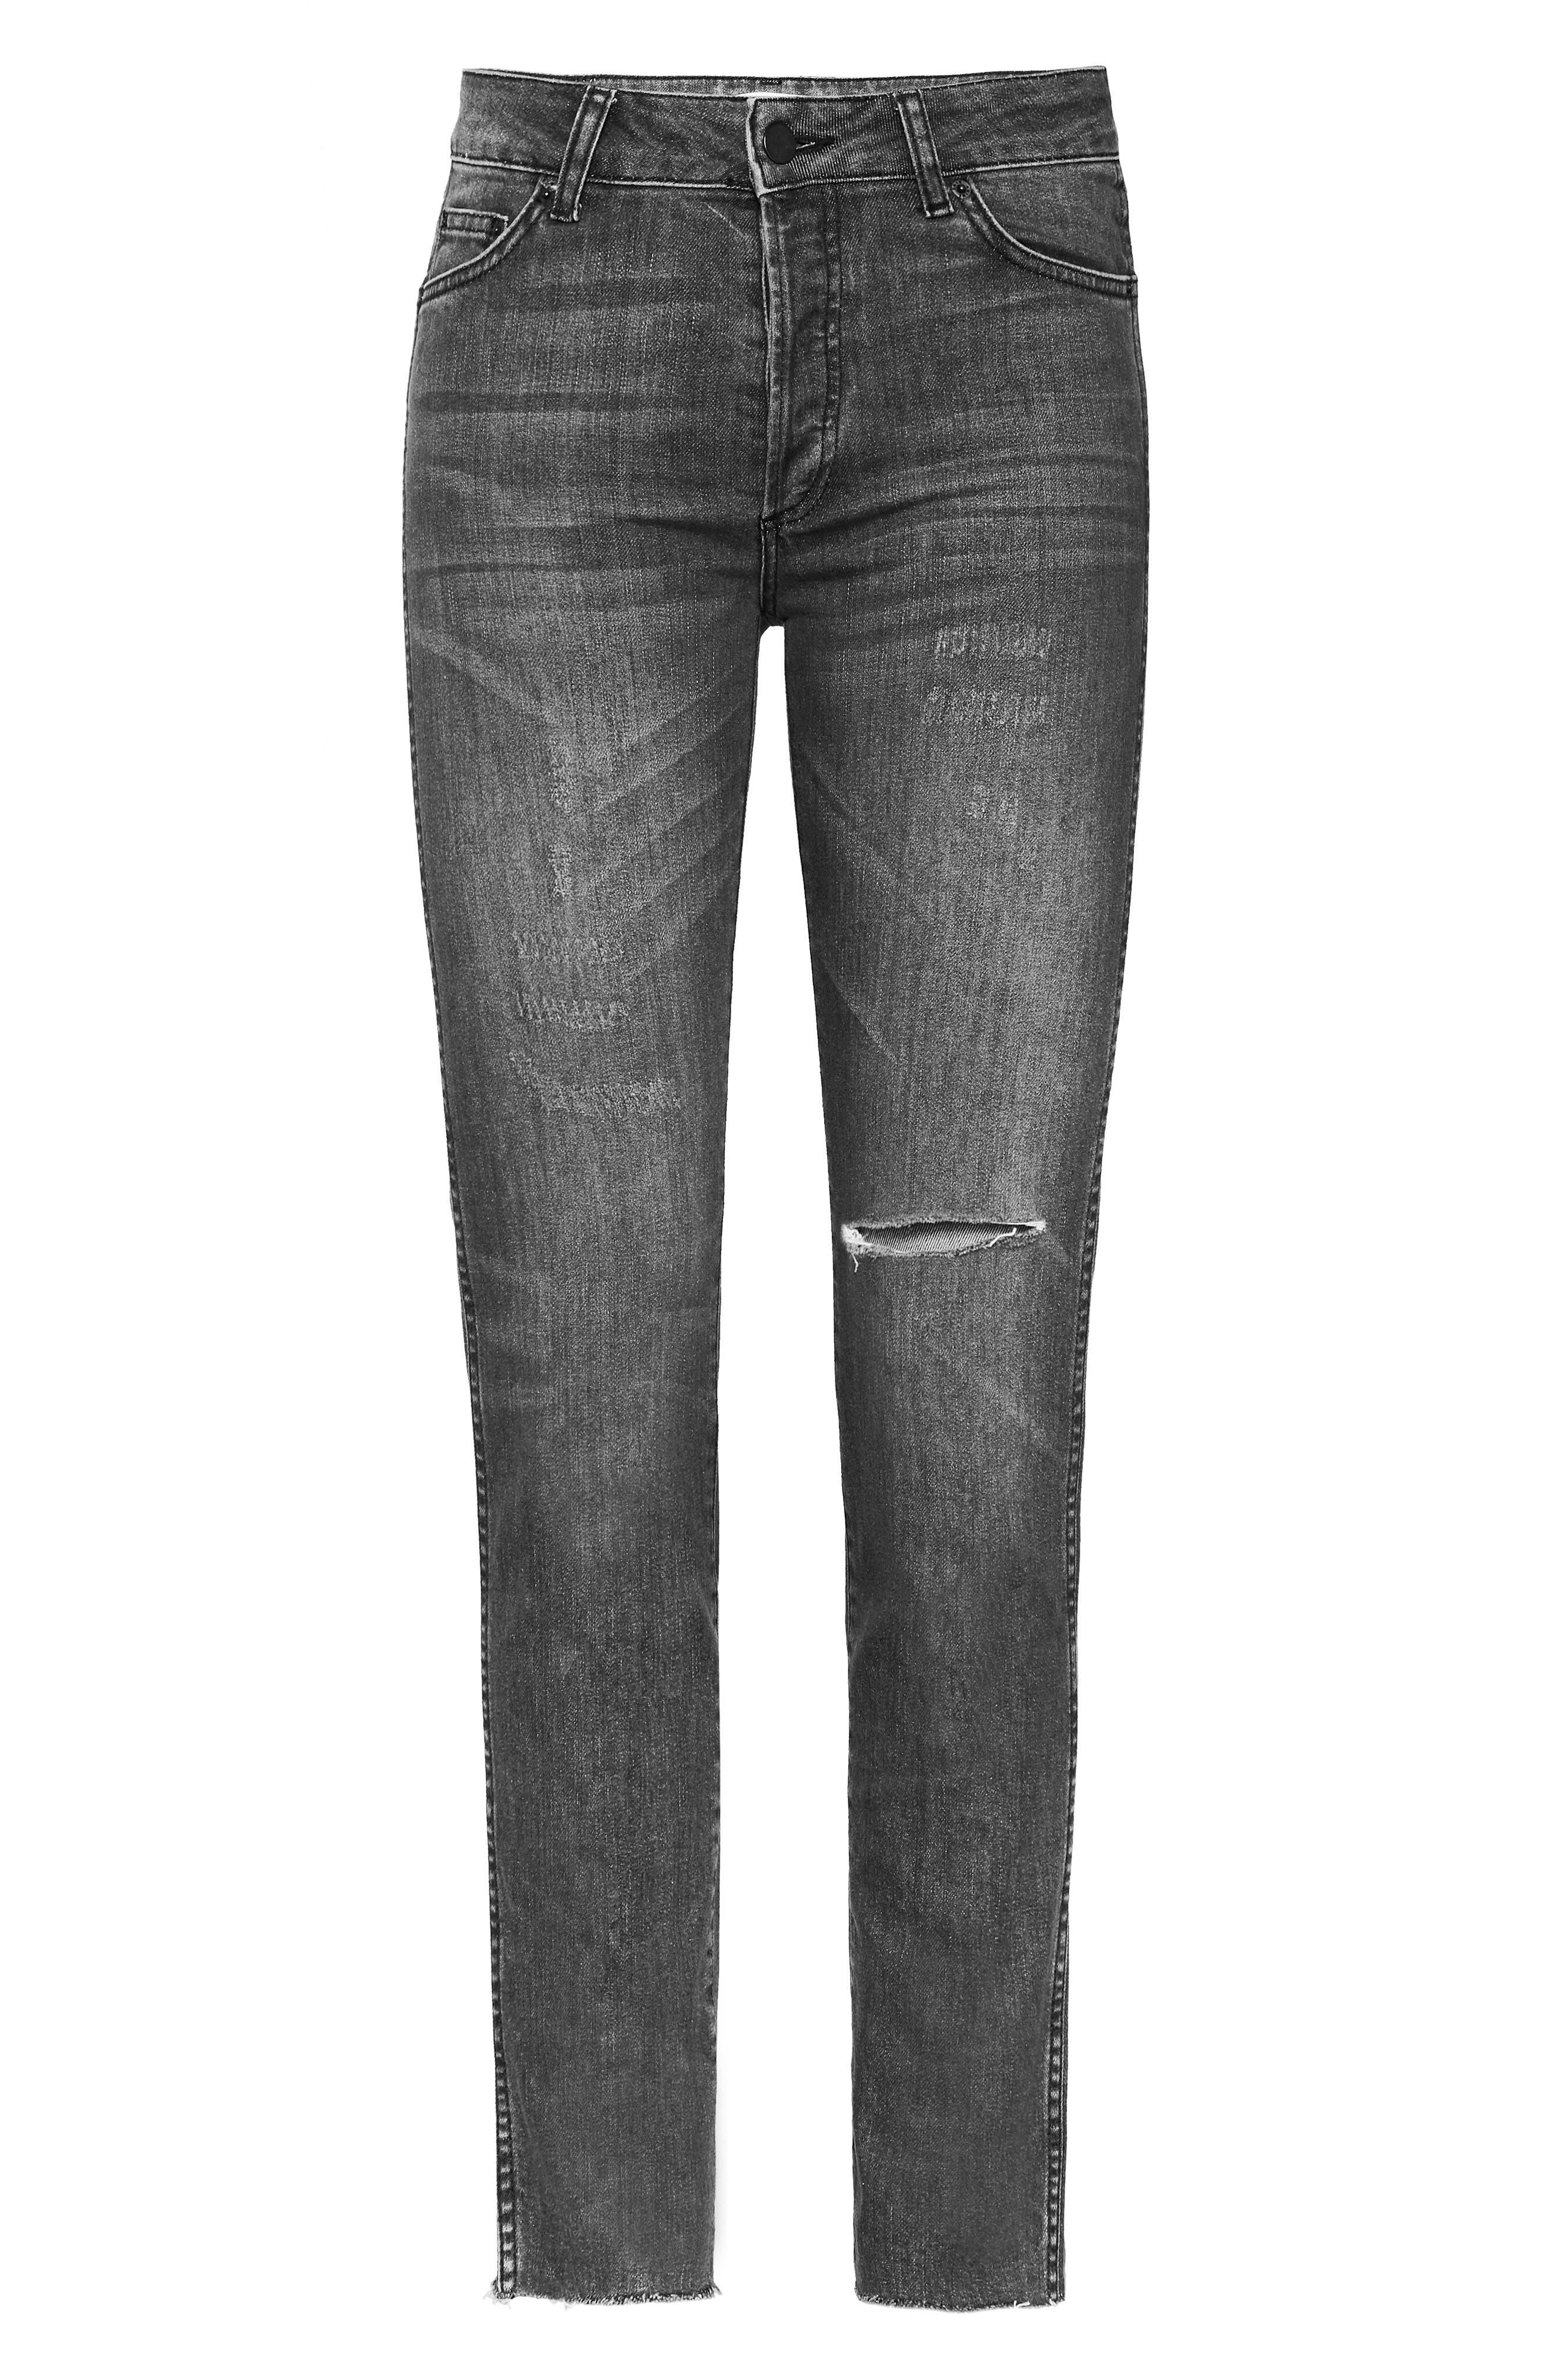 Kara Skinny Jeans,                             Alternate thumbnail 5, color,                             CHARCOAL